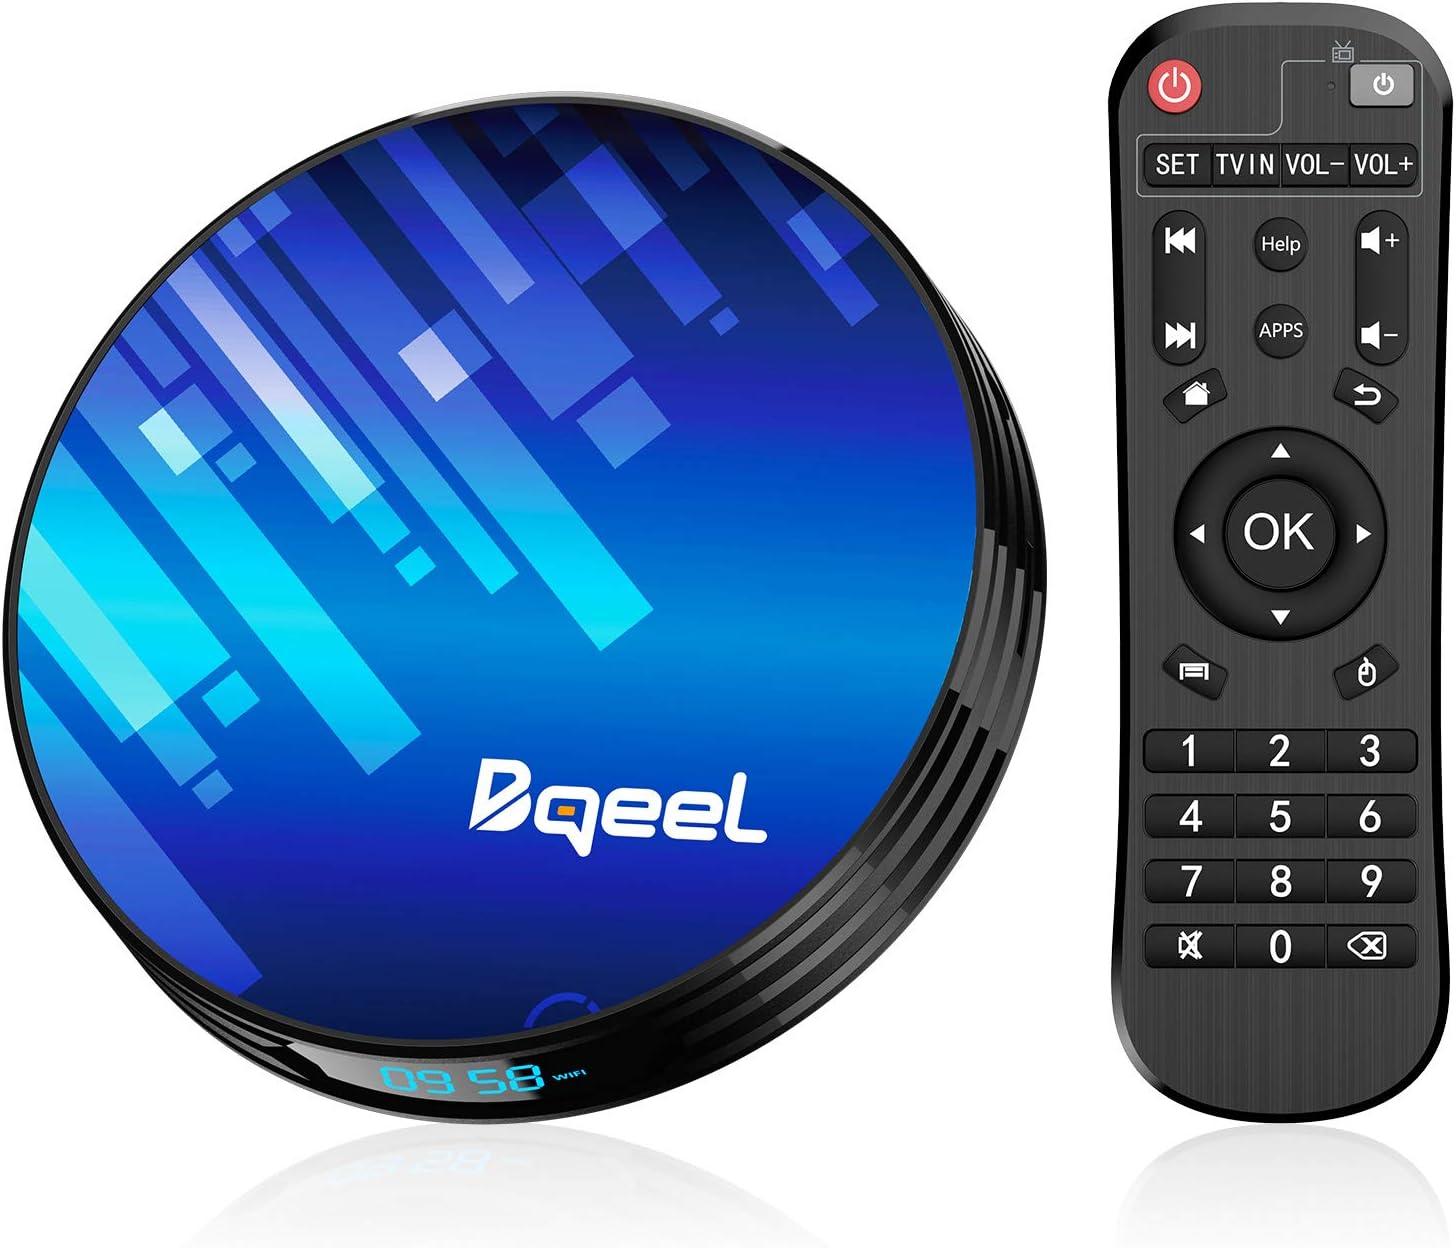 Última Android TV Box - Bqeel Android TV Box 9.0 【4GB+64GB】 Amlogic S905X3 Quad Core Arm Cortex A53 con Dual-WiFi 2.4GHz/5.0GHz, LAN 1000M,BT 4.0, 8K*4K UHD H.265, USB 3.0 Smart TV Box